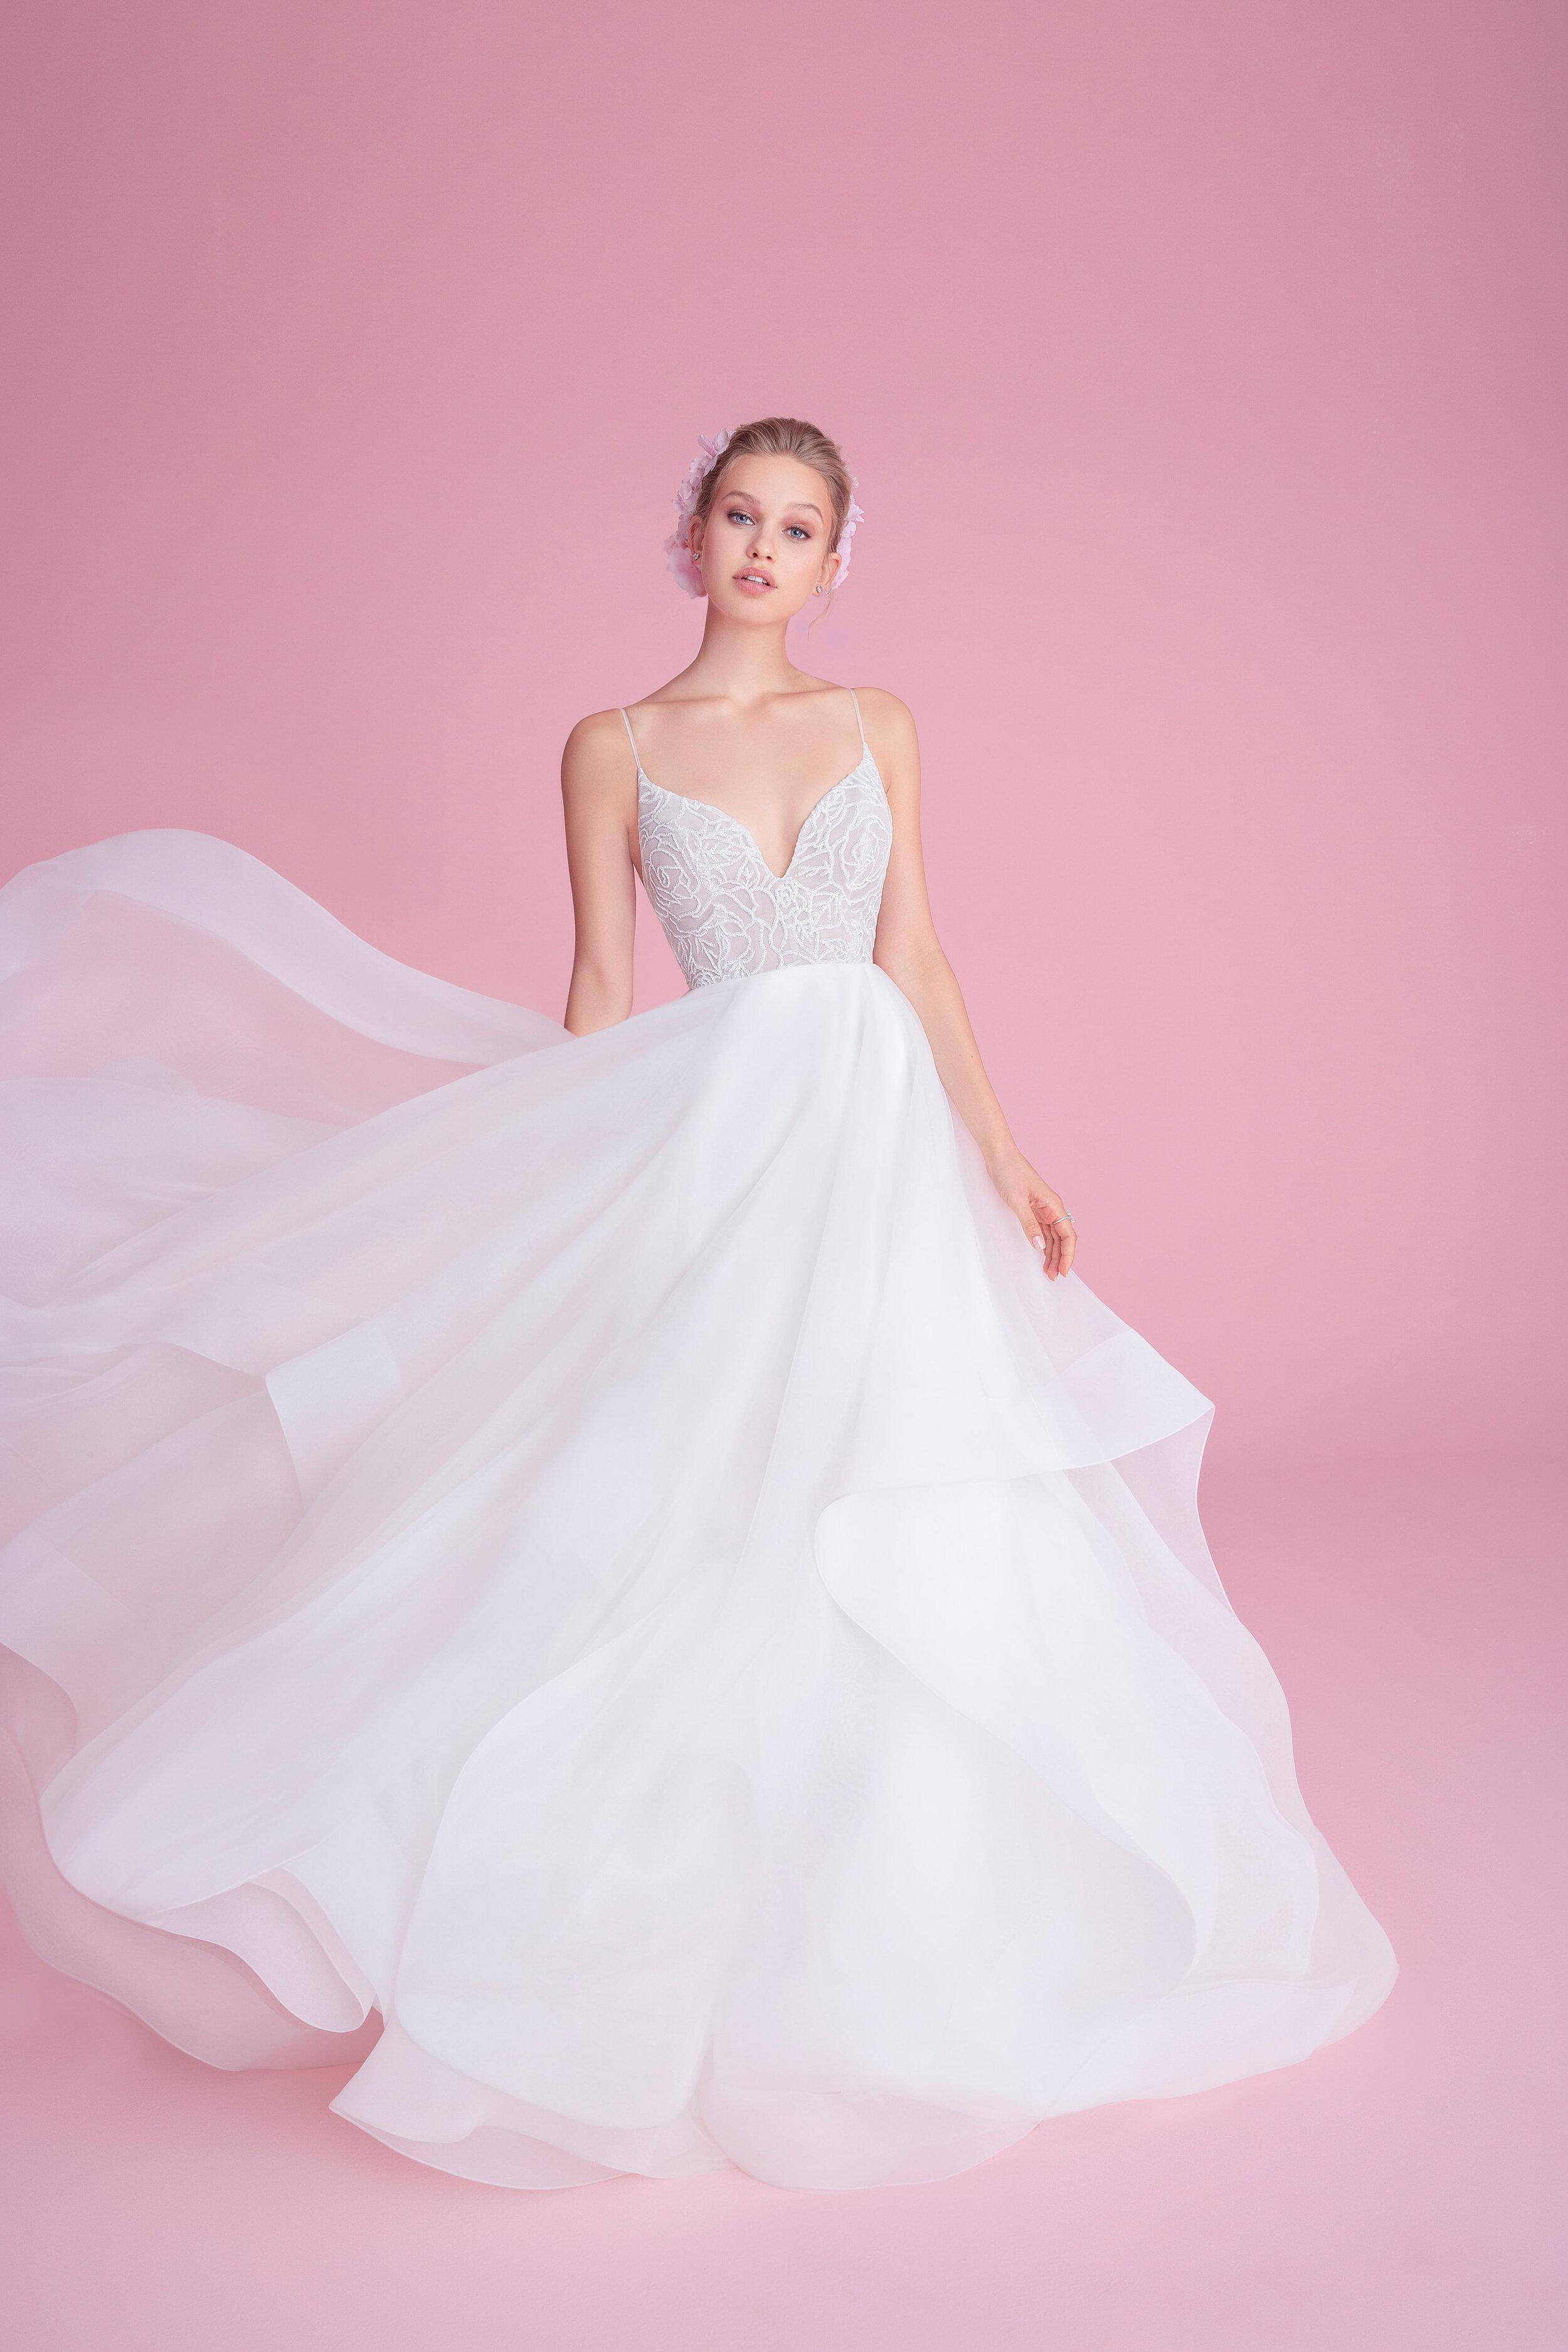 Blush by Hayley Paige - RomanticFashionableFeminine$2,000 - $3,000